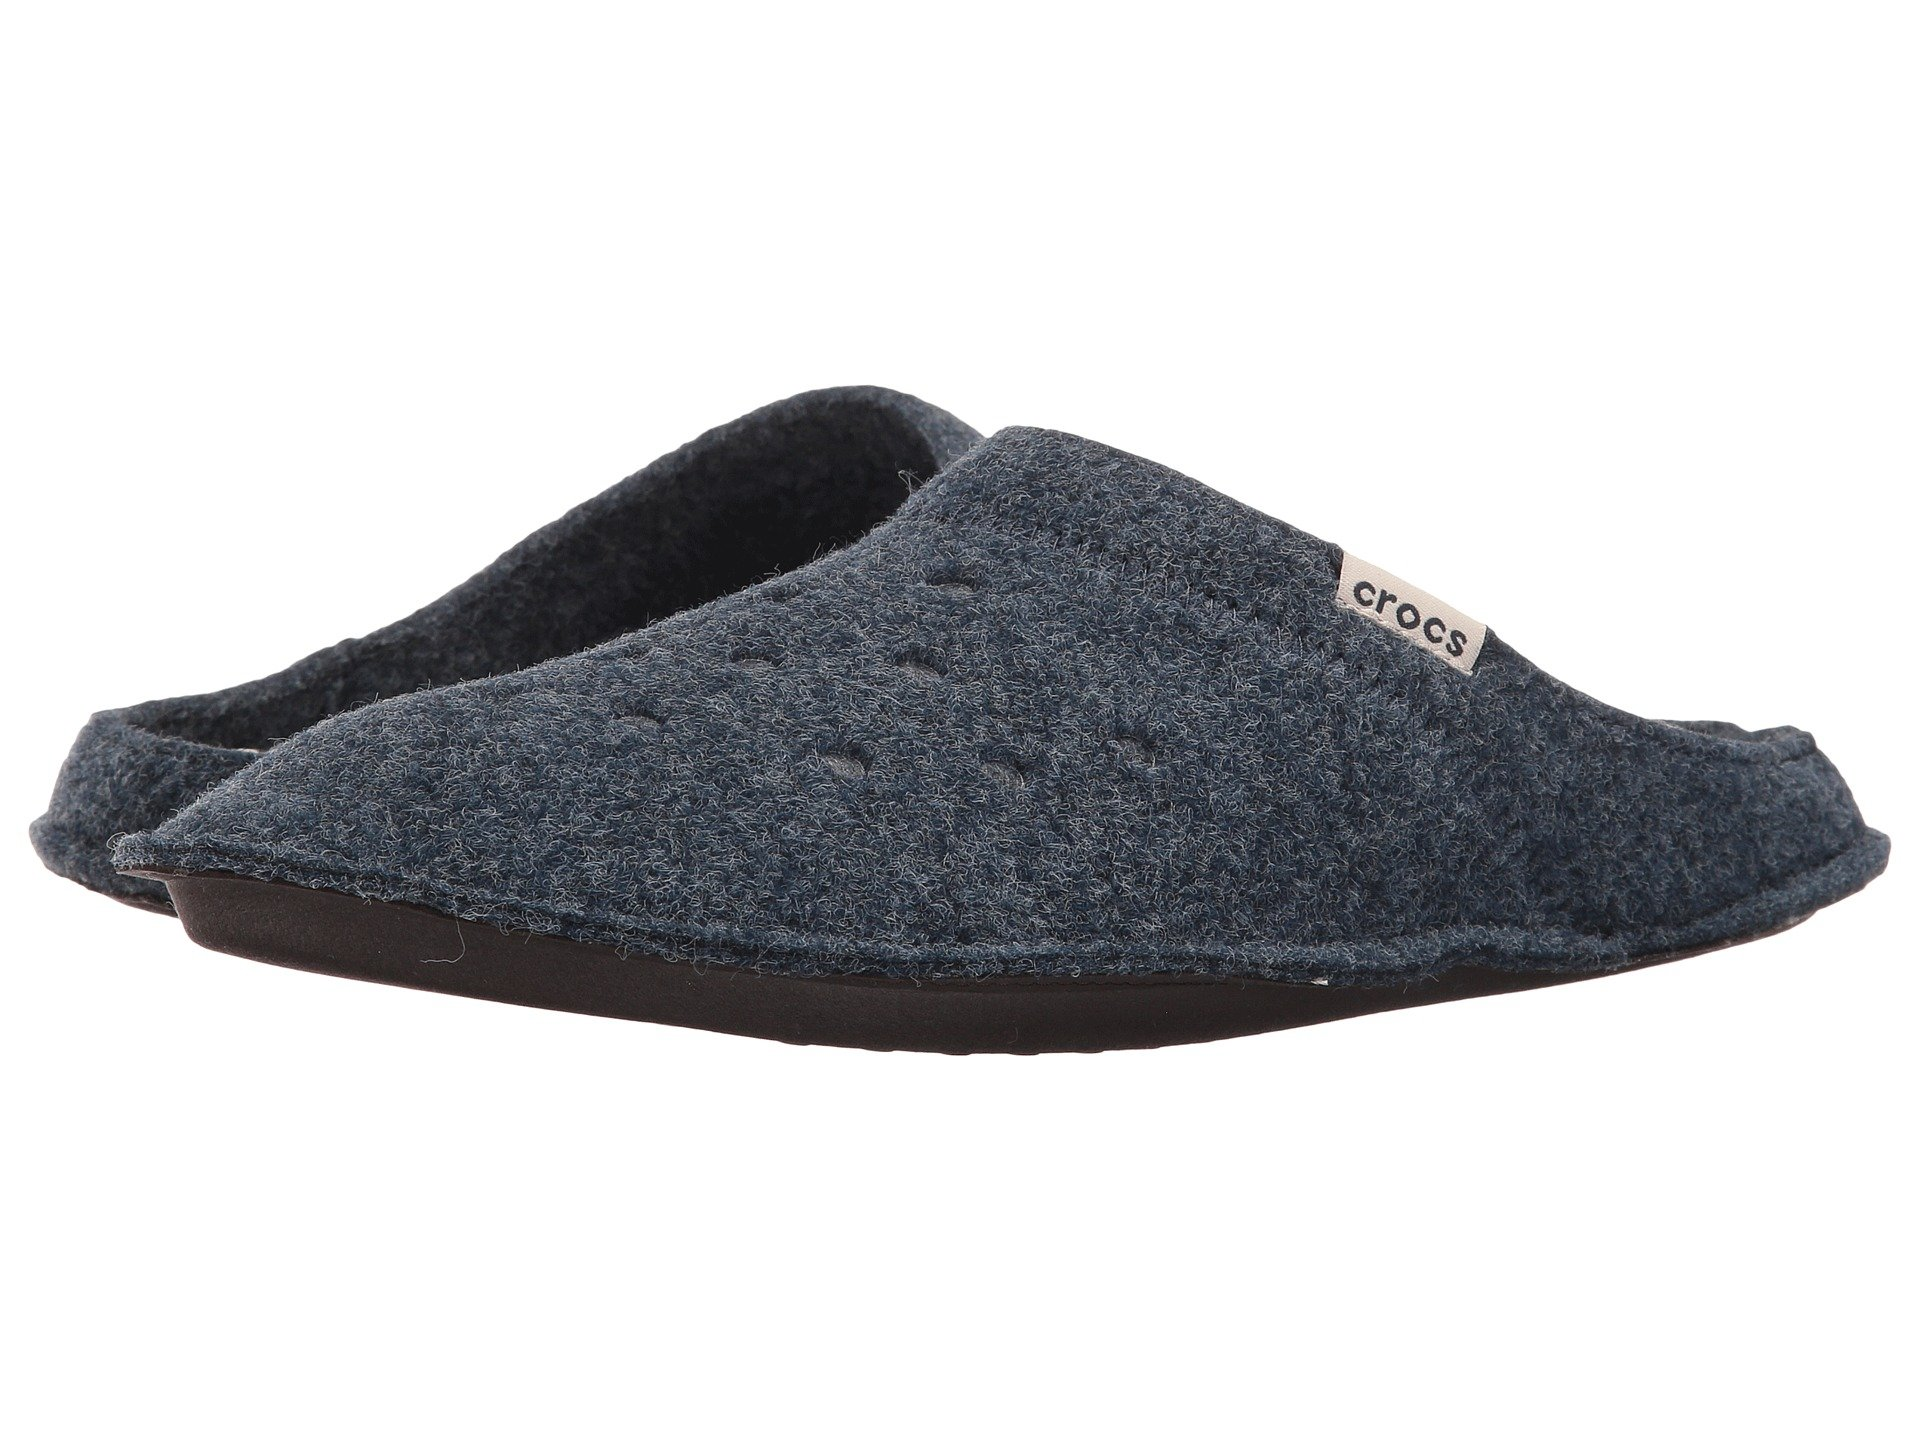 Zapatos de Descanso para Hombre Crocs Classic Slipper  + Crocs en VeoyCompro.net